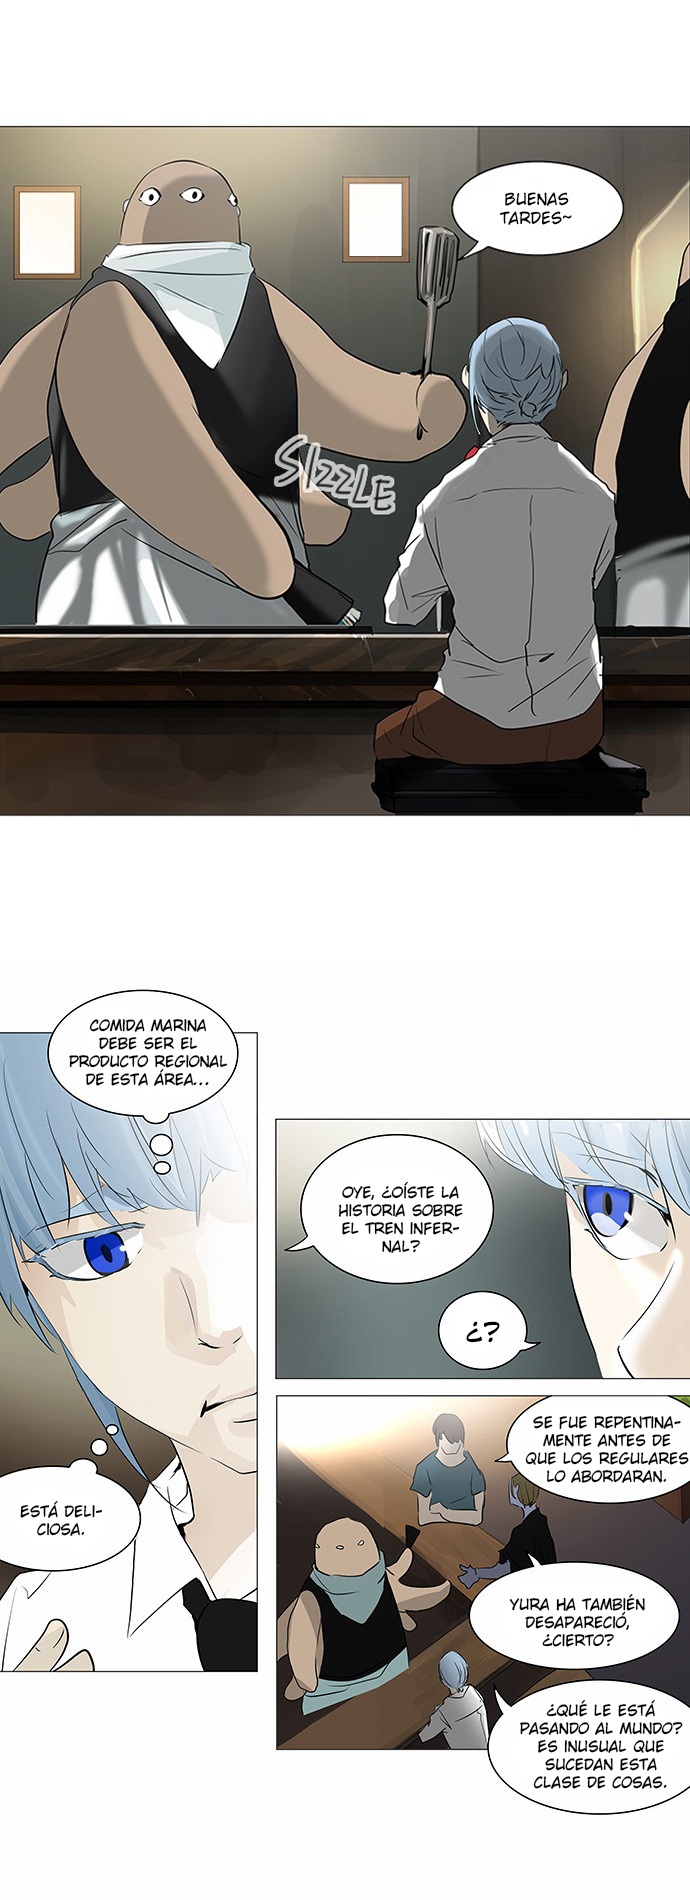 http://c5.ninemanga.com/es_manga/21/149/389211/0bcc8ab4a61a1d1f3f102846d9617eb8.jpg Page 8